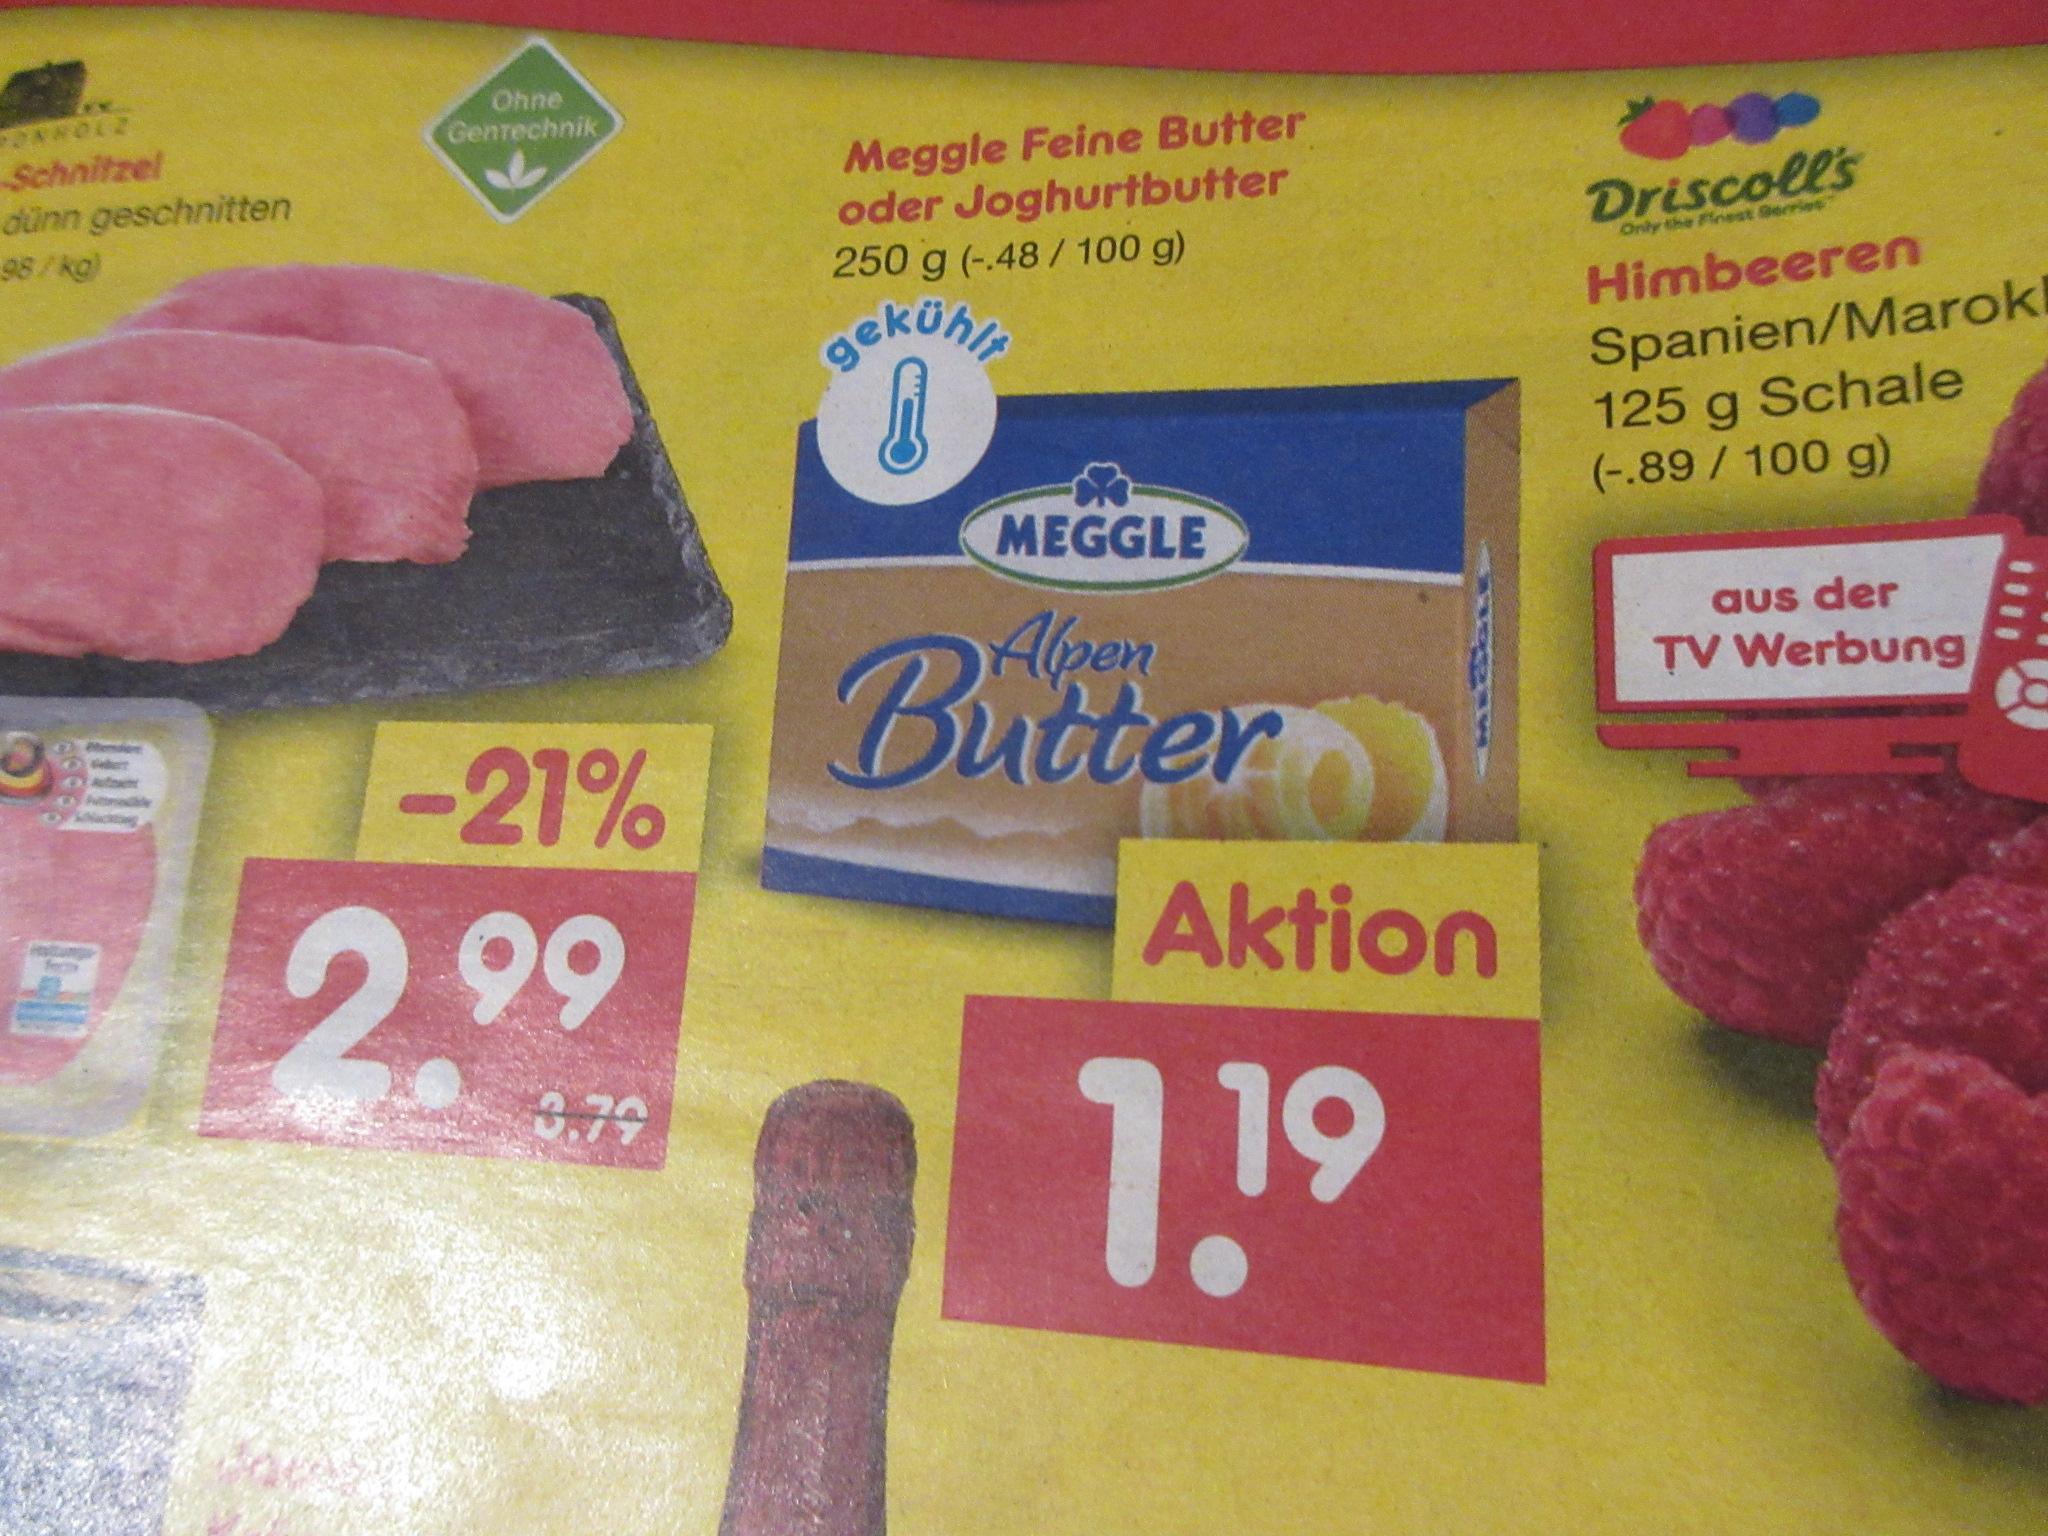 Netto - Meggle Butter 1,19 / Bei HIT für 1,25 Euro zu bekommen